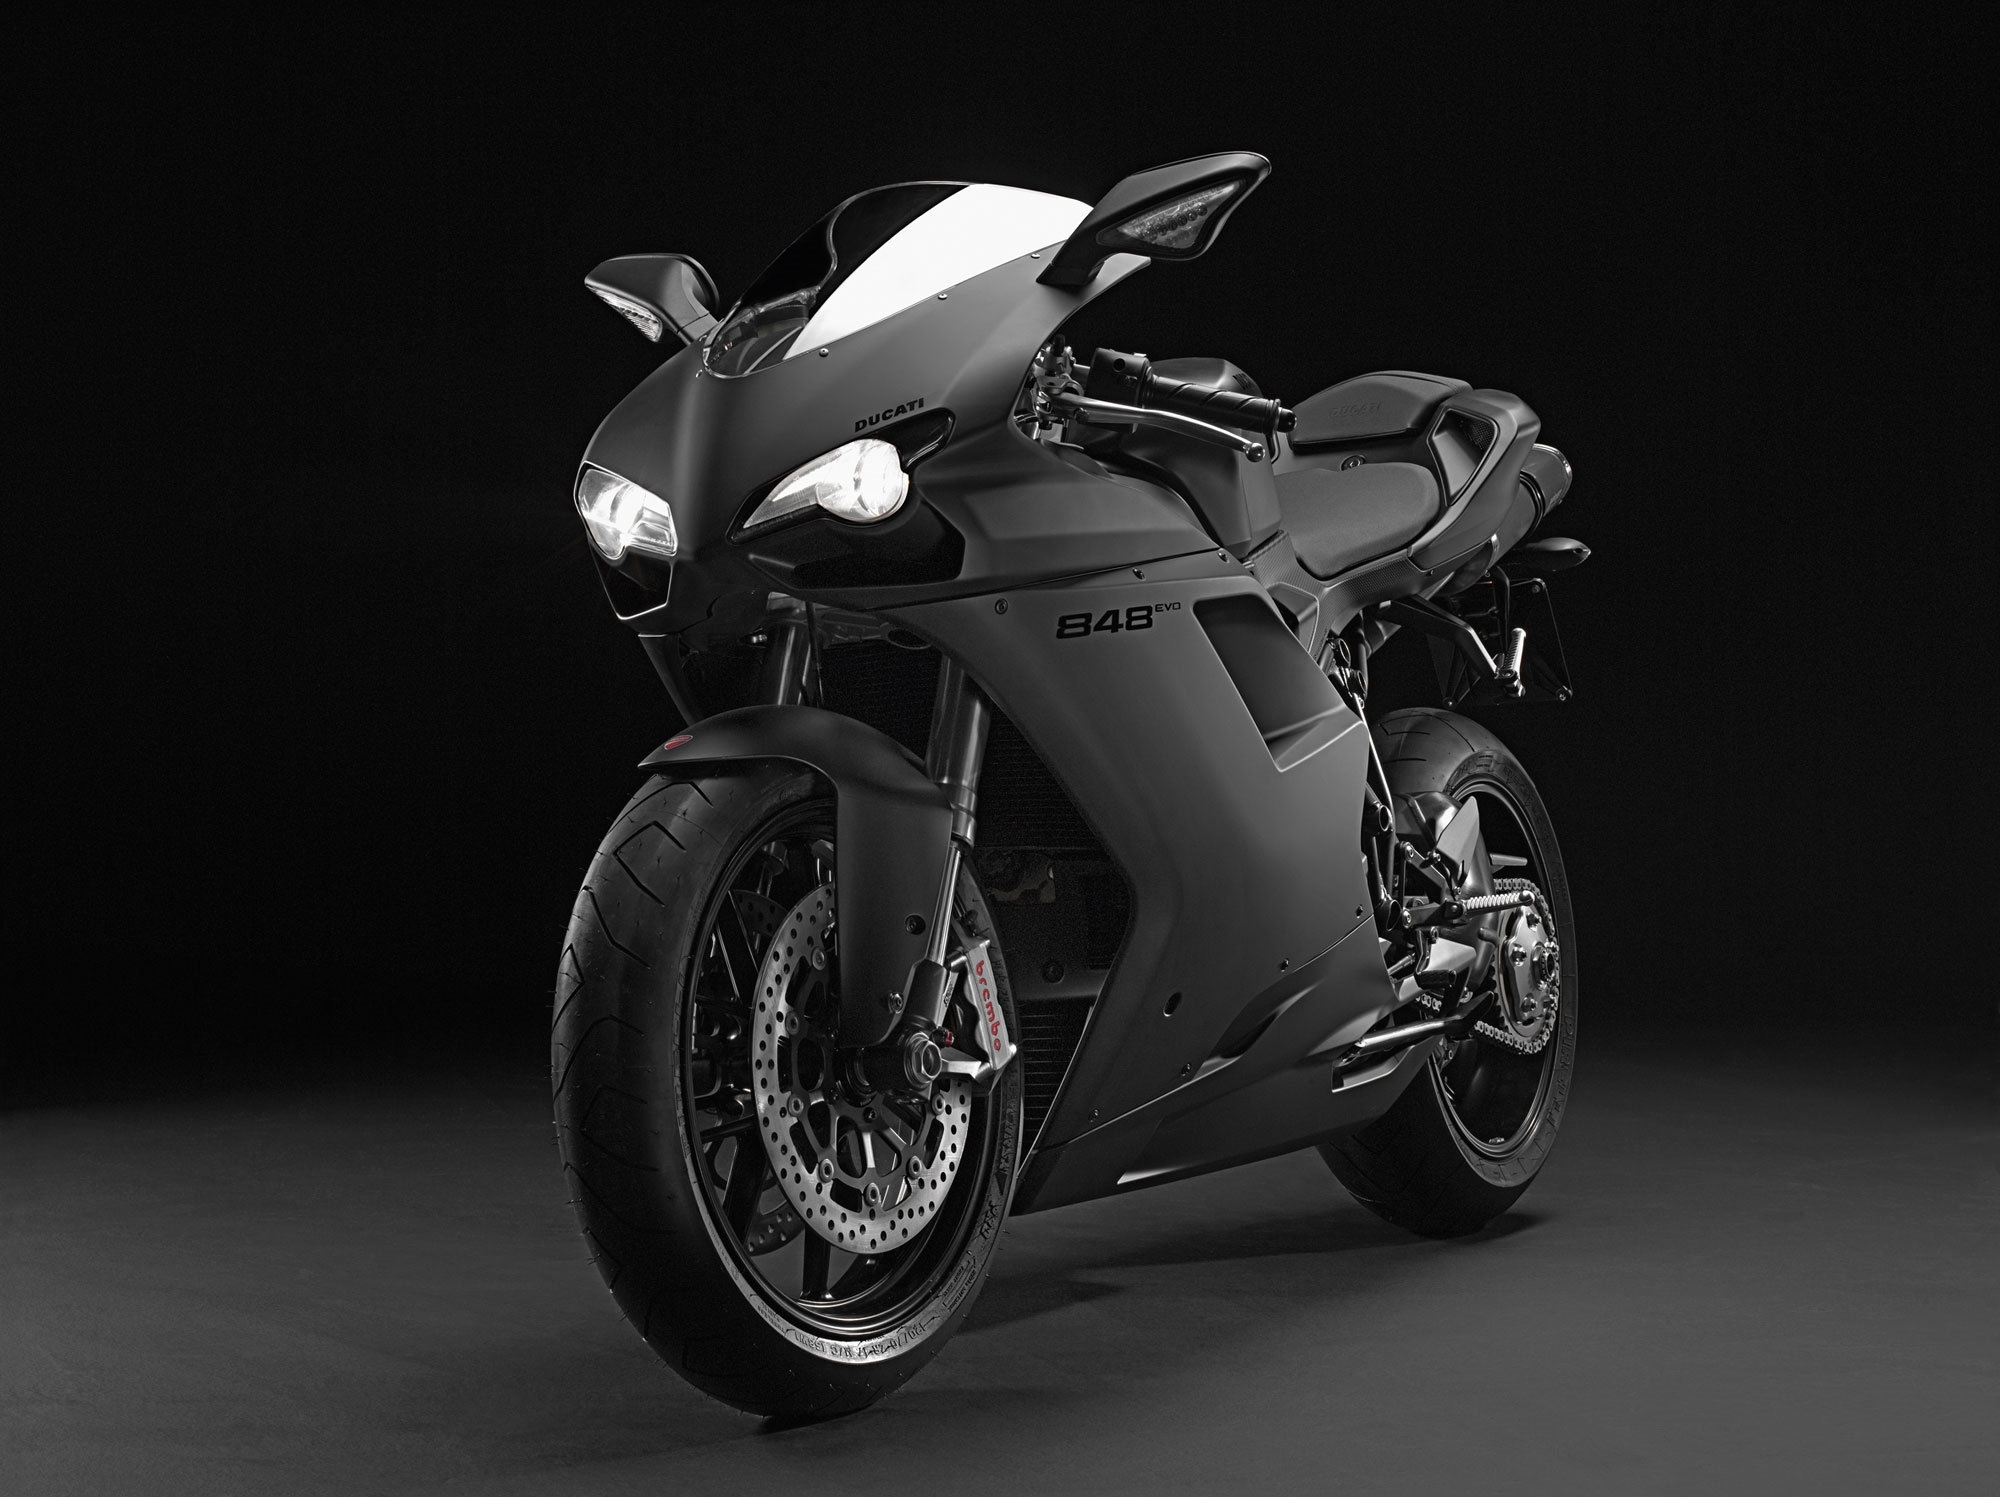 ducati superbike pics